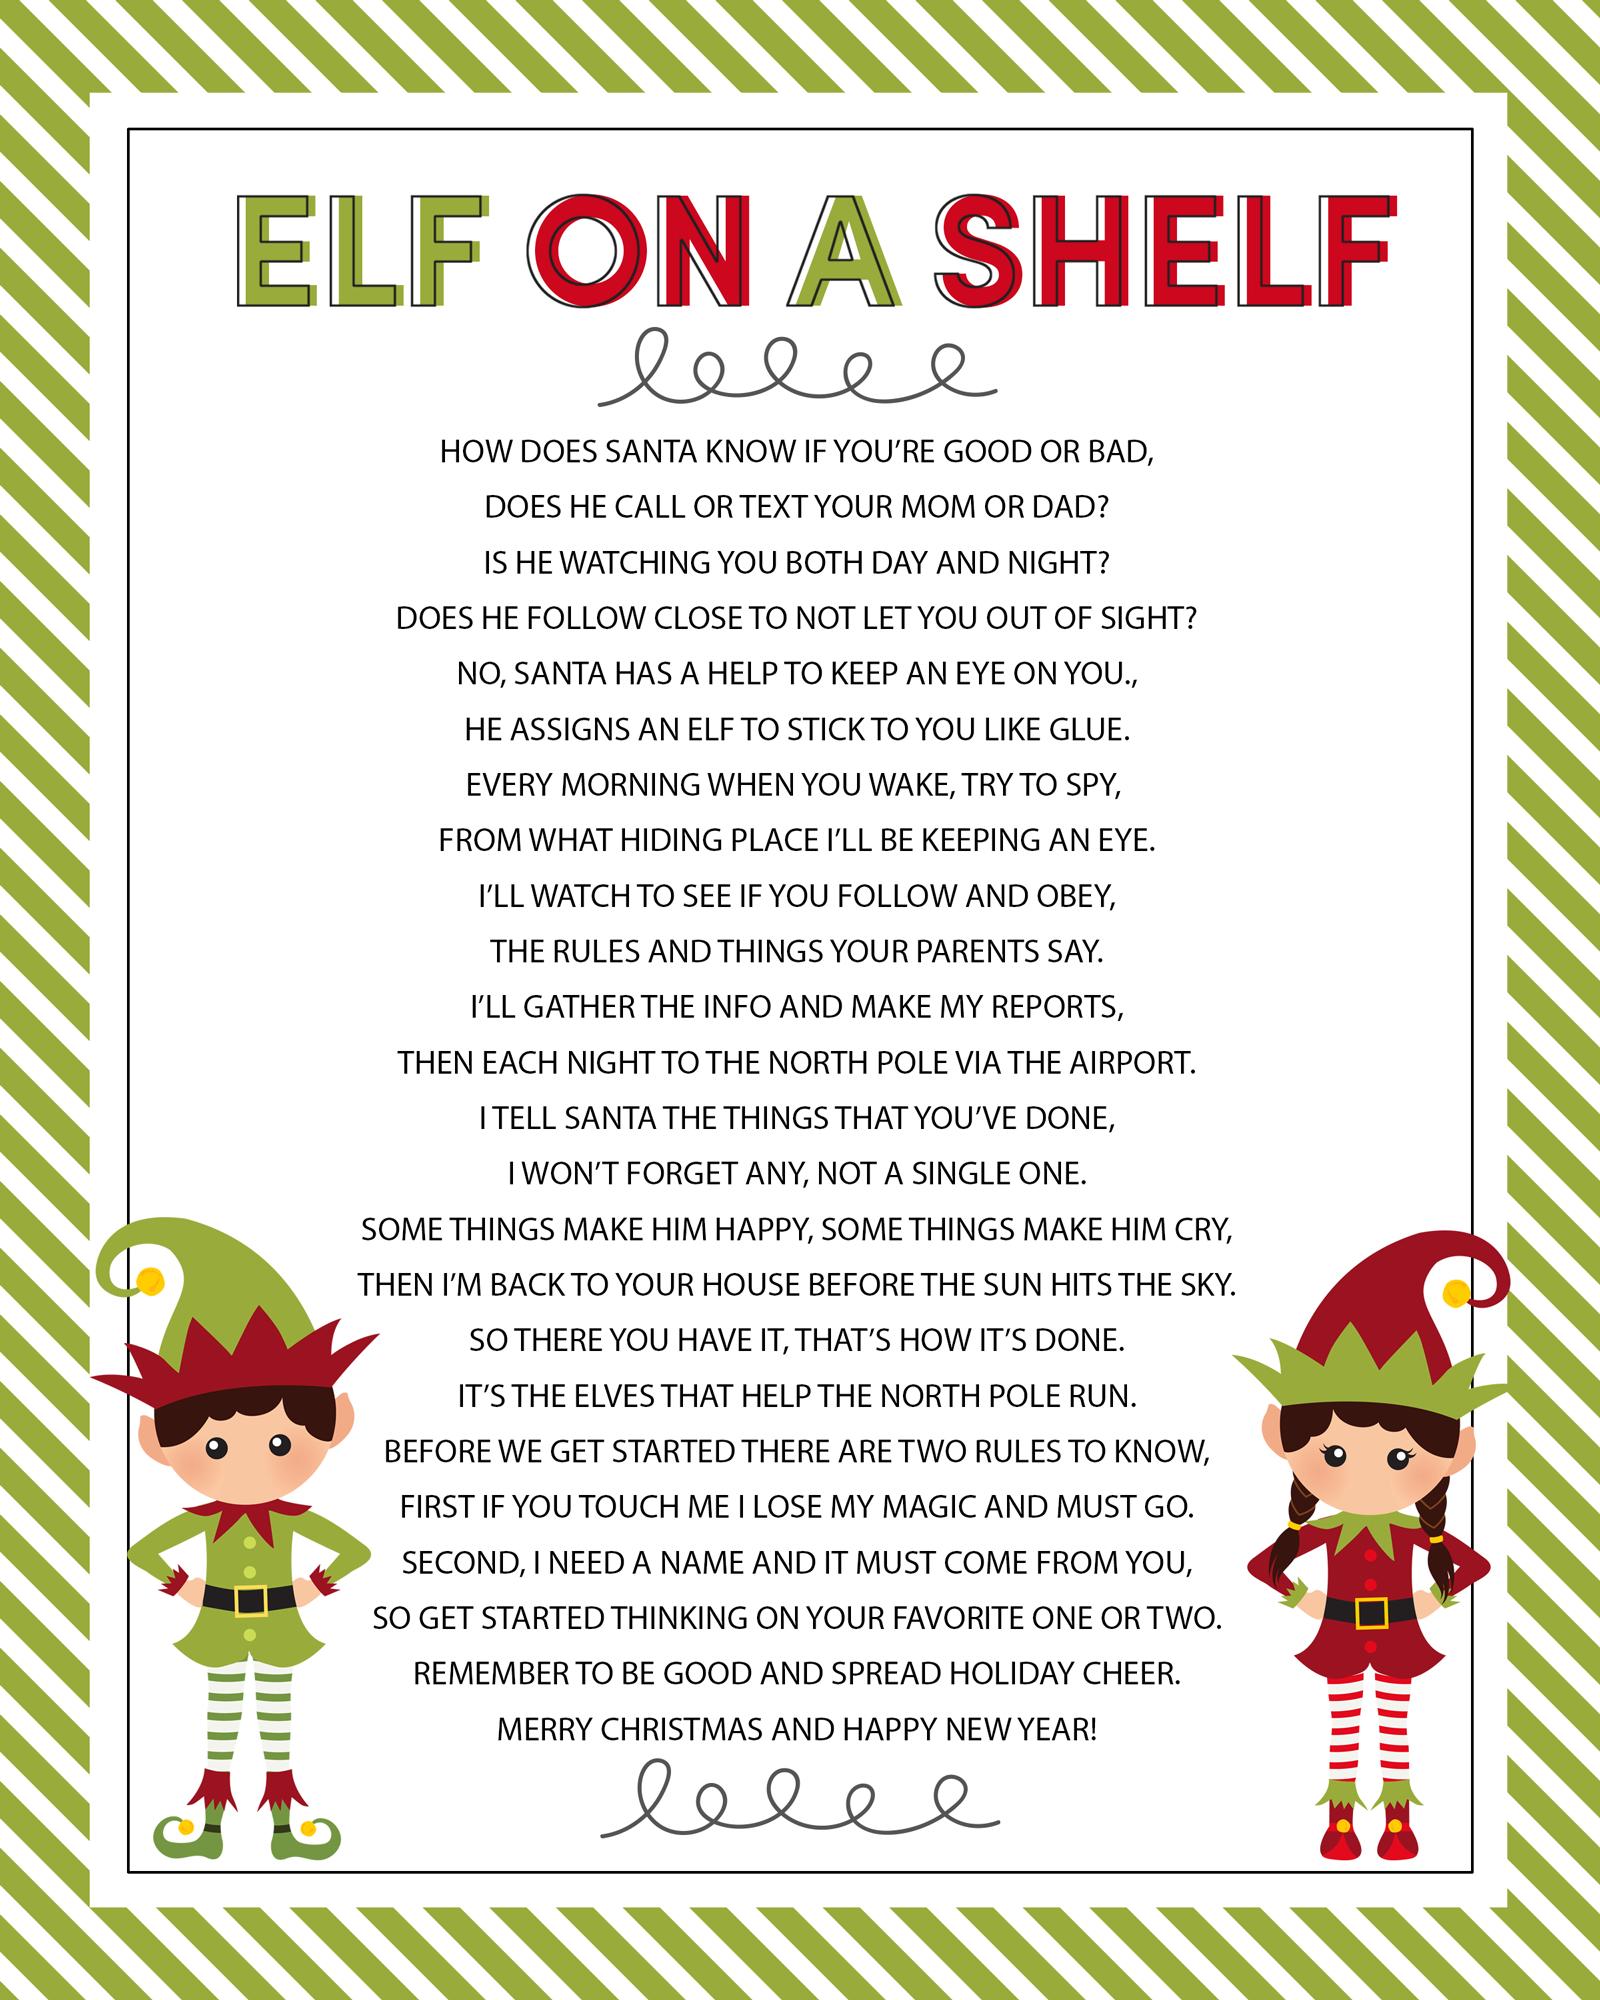 Elf On The Shelf Story - Free Printable Poem   Elf On Shelf Ideas - Free Printable Elf On The Shelf Story